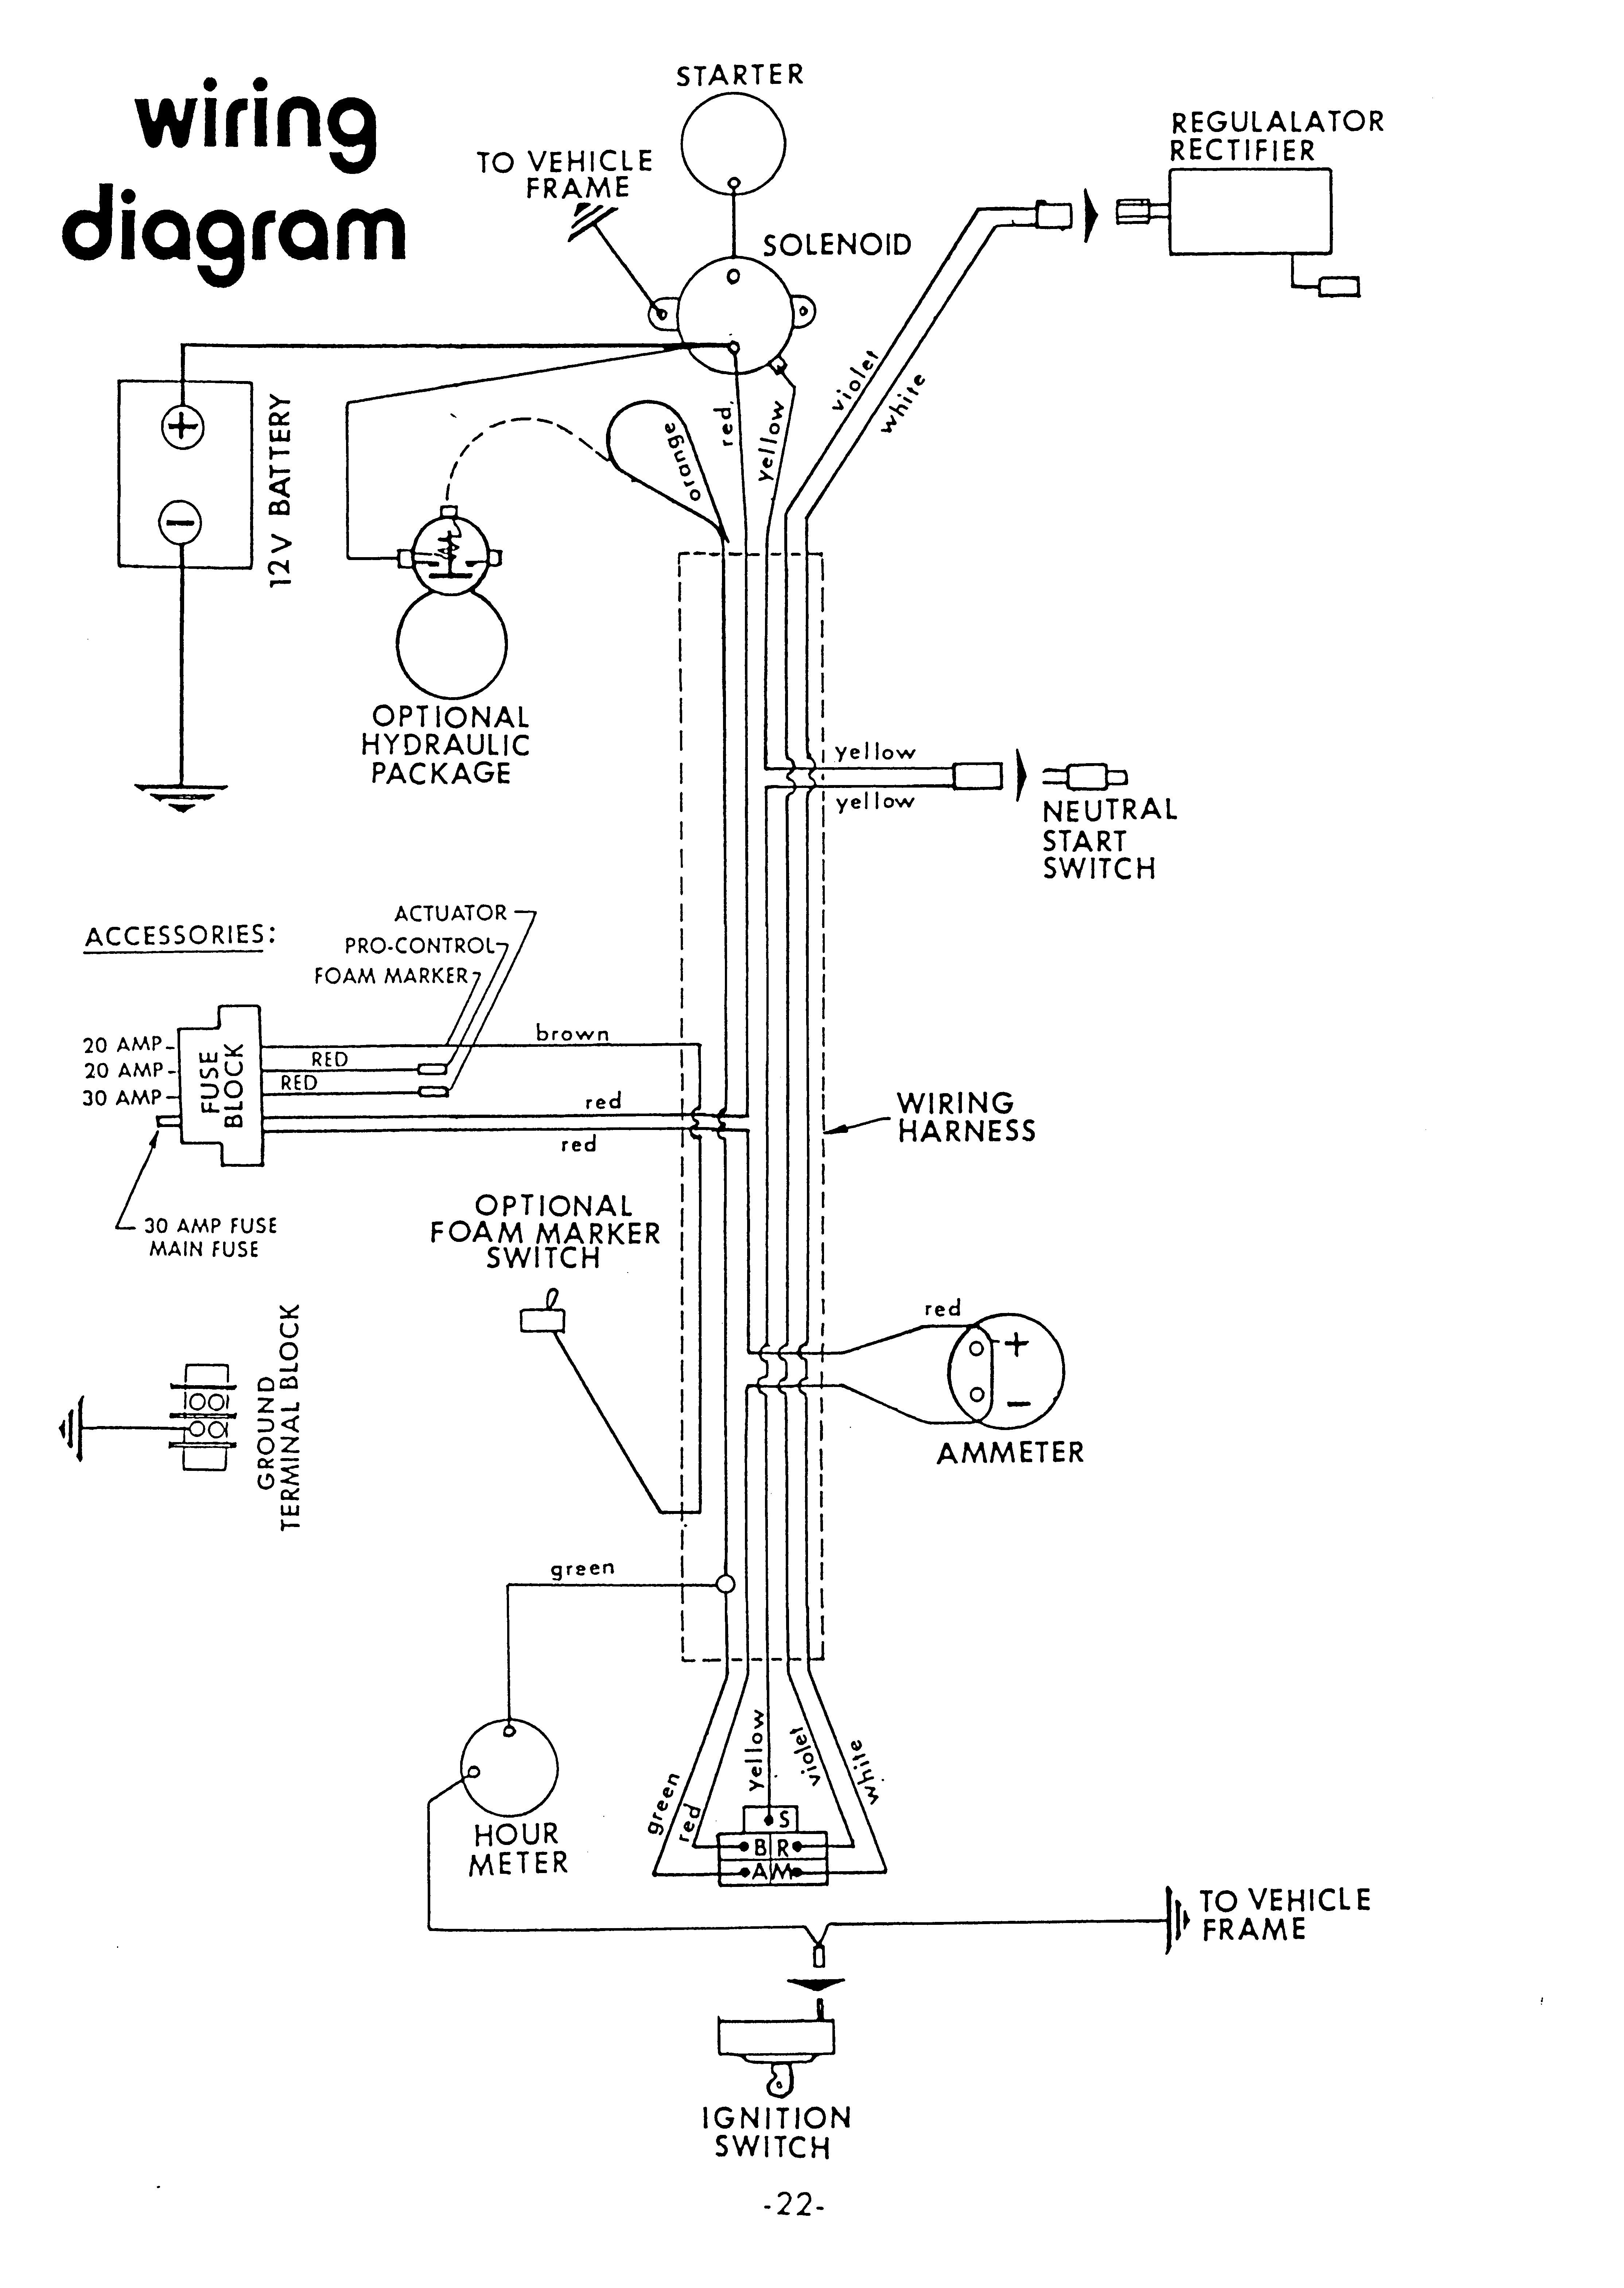 Diagram Clark Forklift Ignition Switch Wiring Diagram Collection Wiring Diagram Full Version Hd Quality Wiring Diagram Classdiagramenum Blimunde It